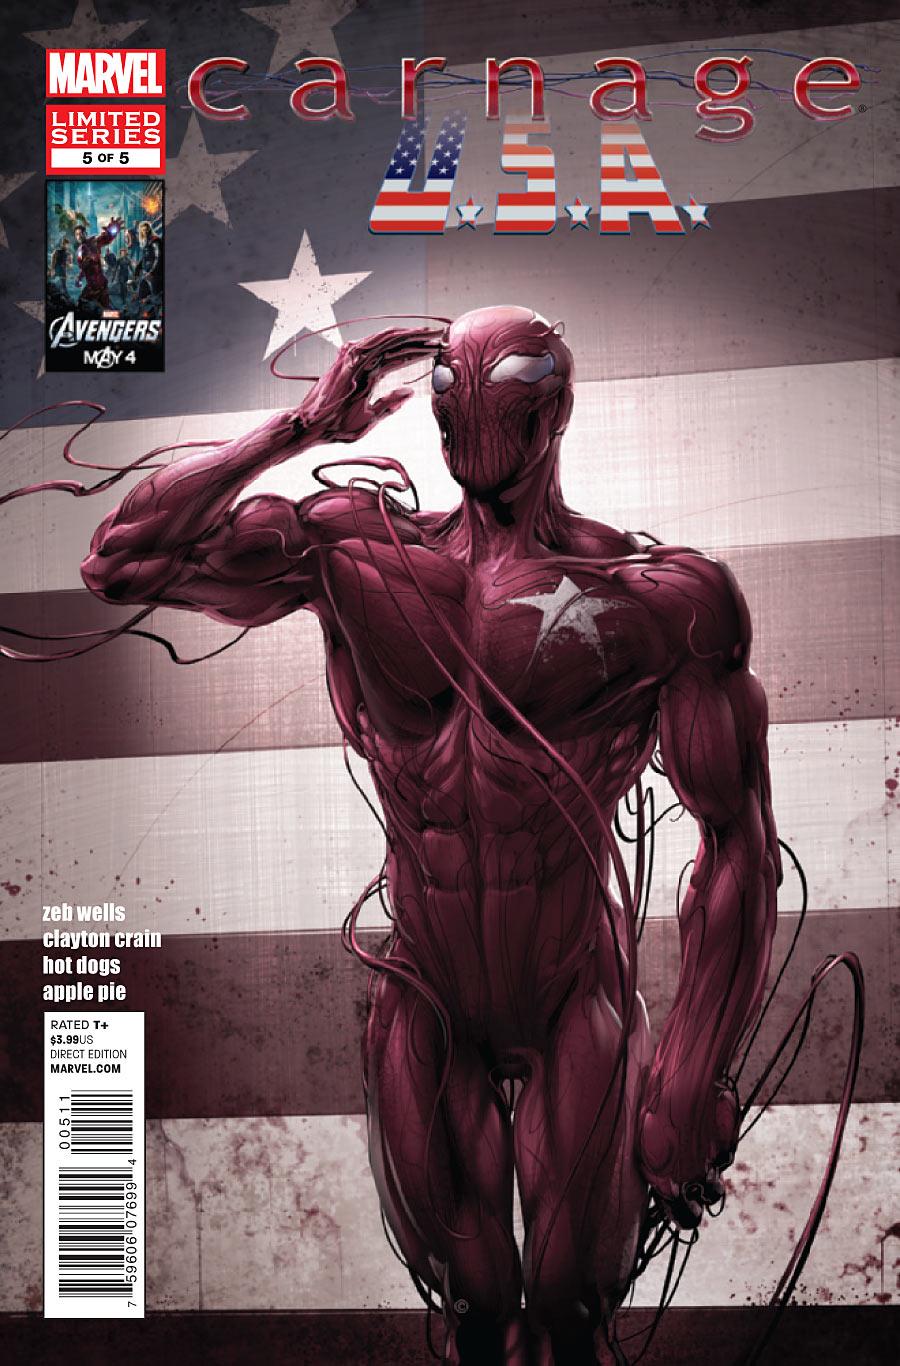 Carnage, U.S.A. Vol 1 5 - Marvel Comics Database